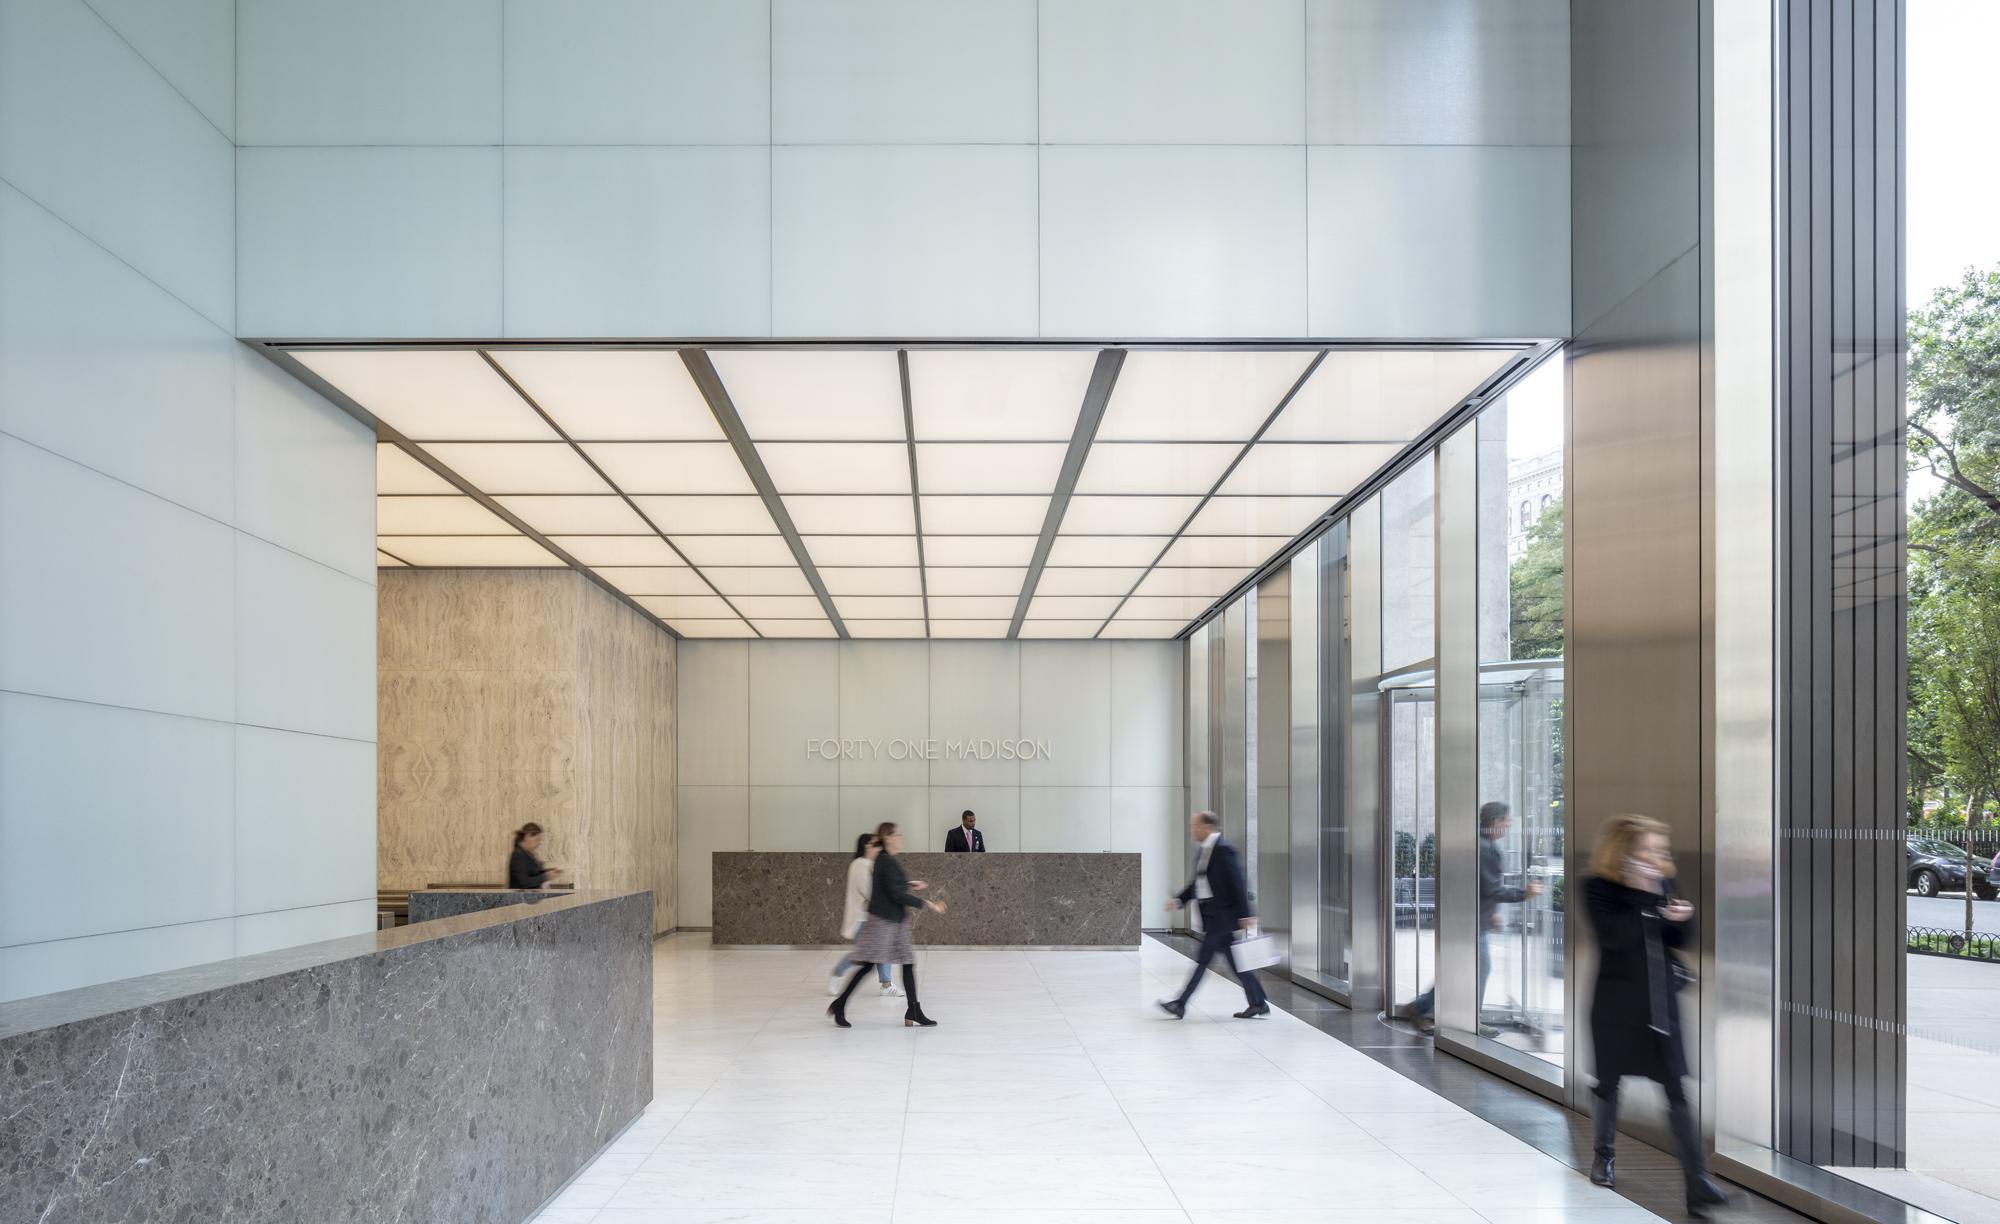 41 Madison, New York, NY   Skidmore, Owings & Merrill